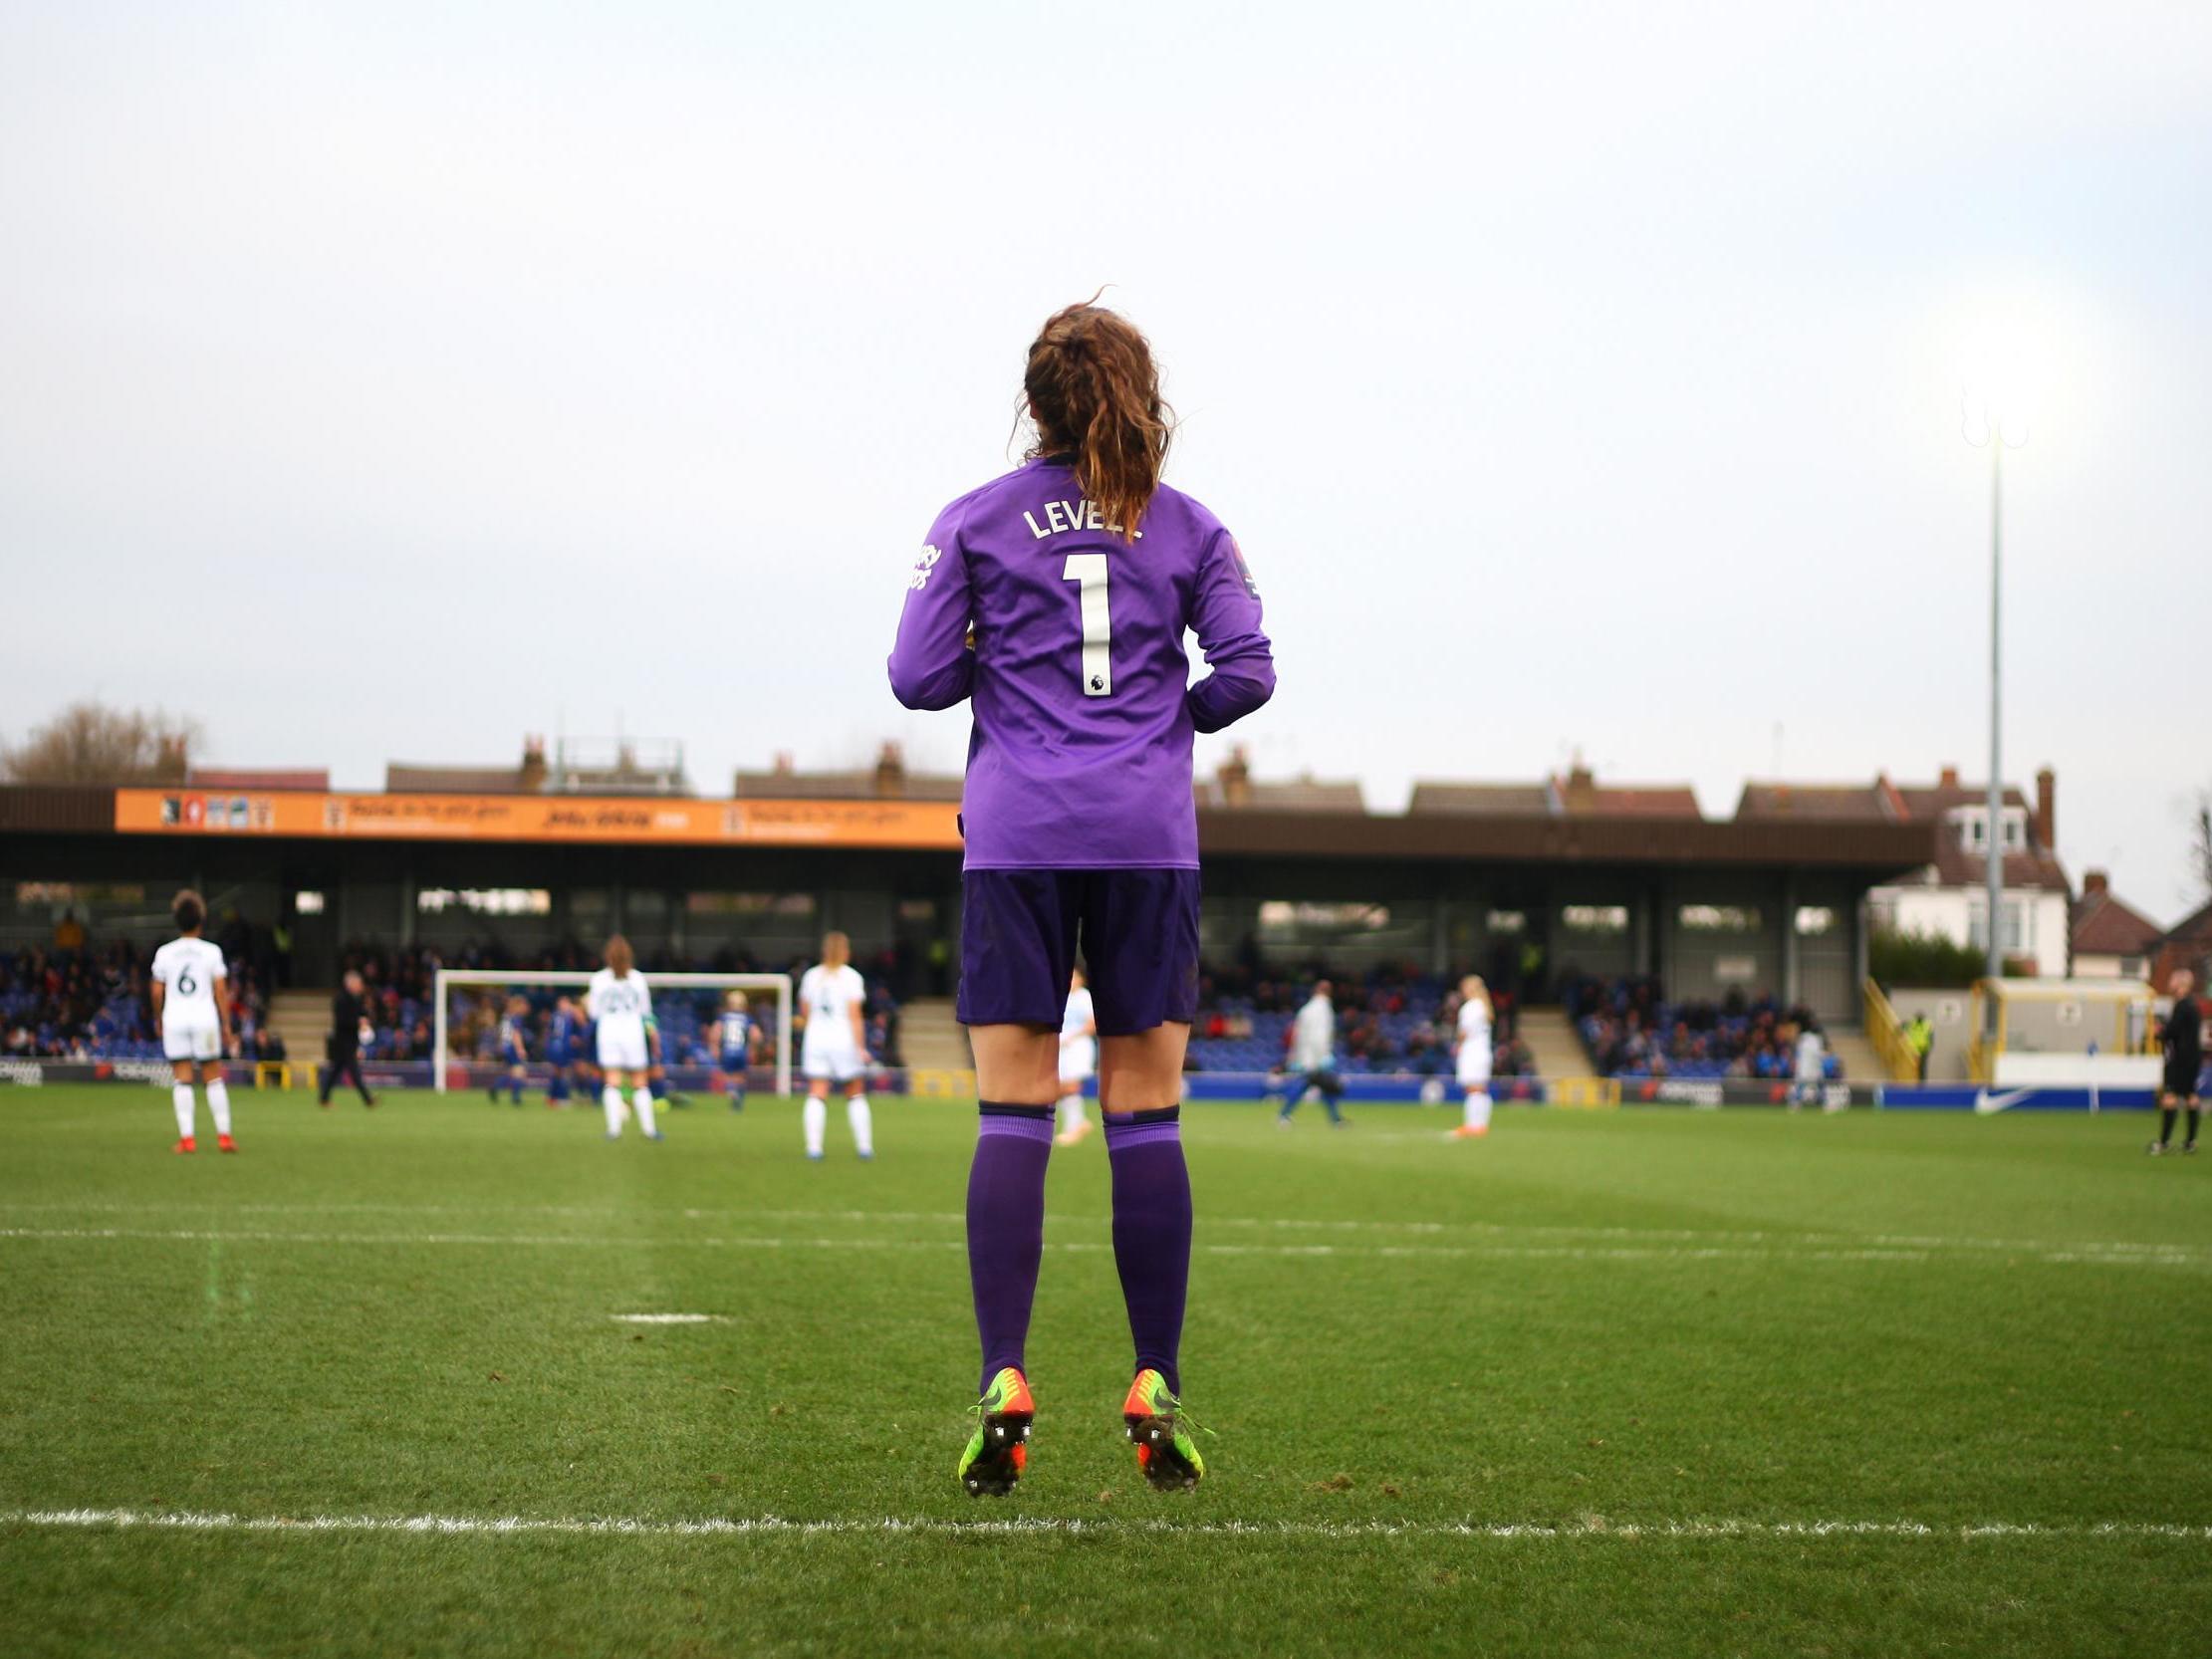 Barclays to sponsor Women's Super League in multi-million deal